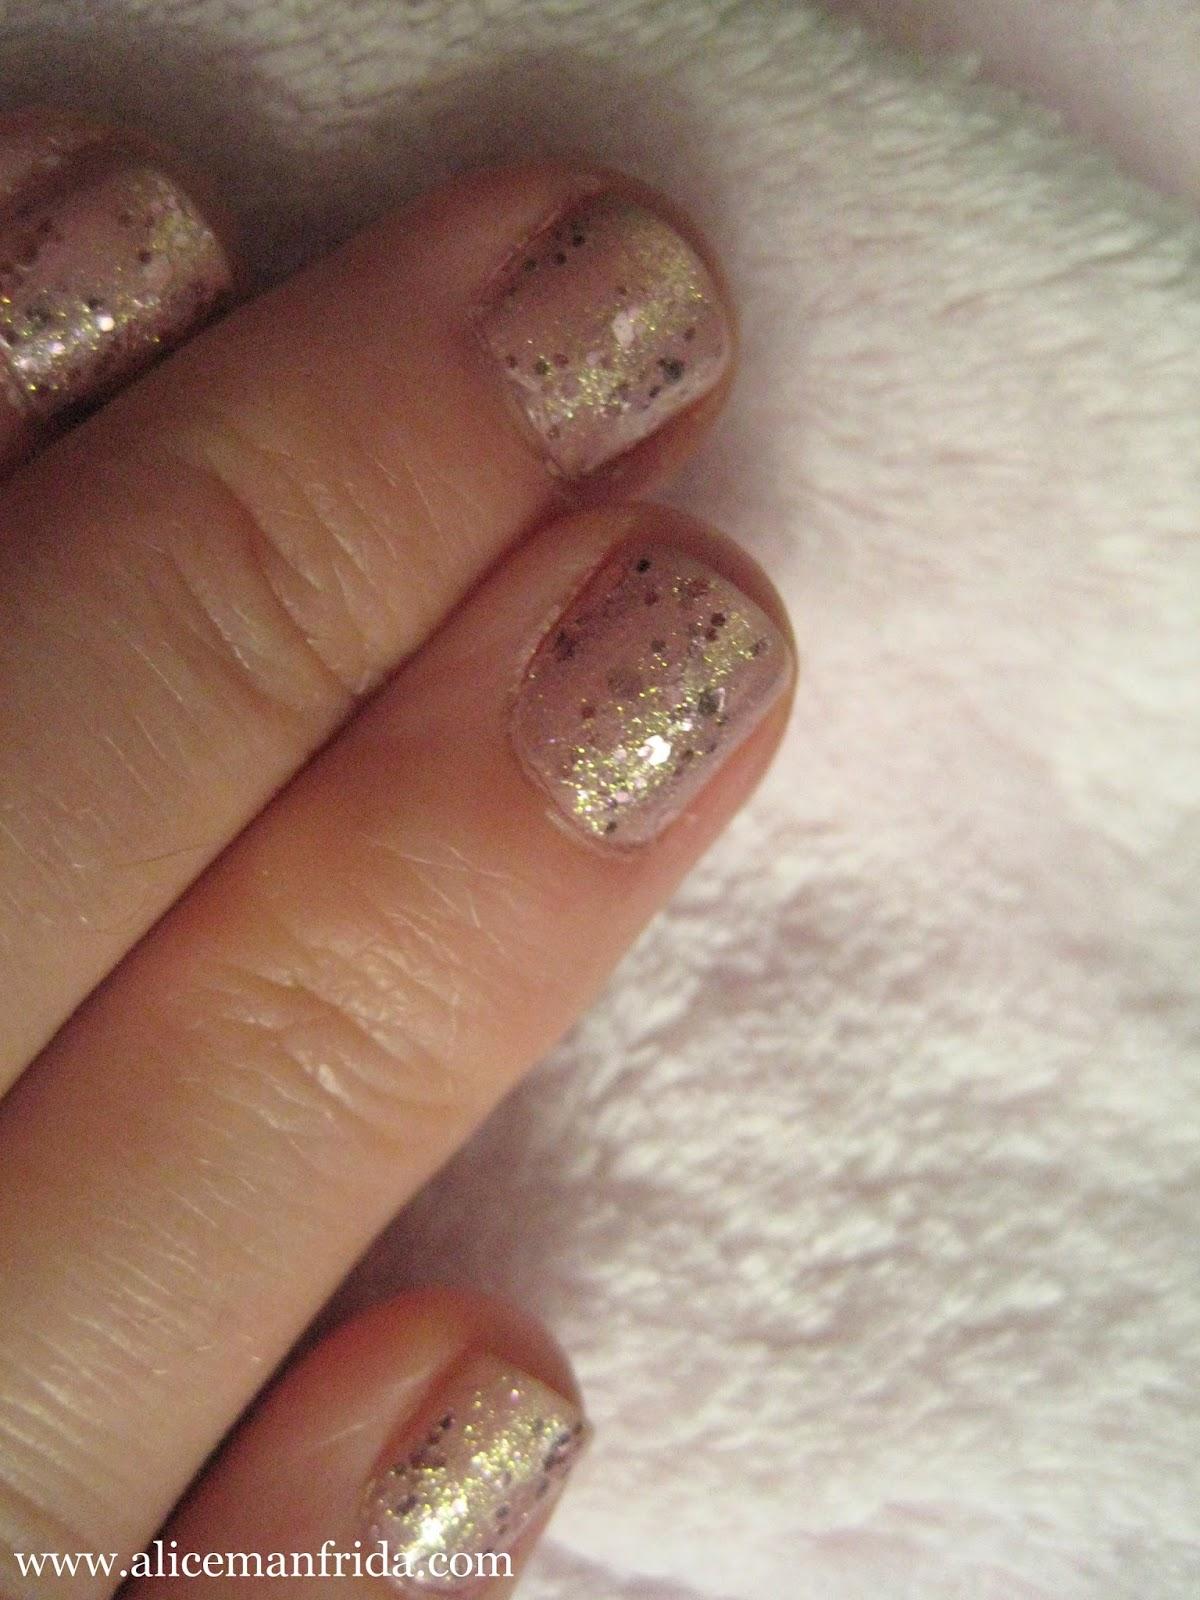 Milani, deborah lippmann, glitter, pink, nails, manicure